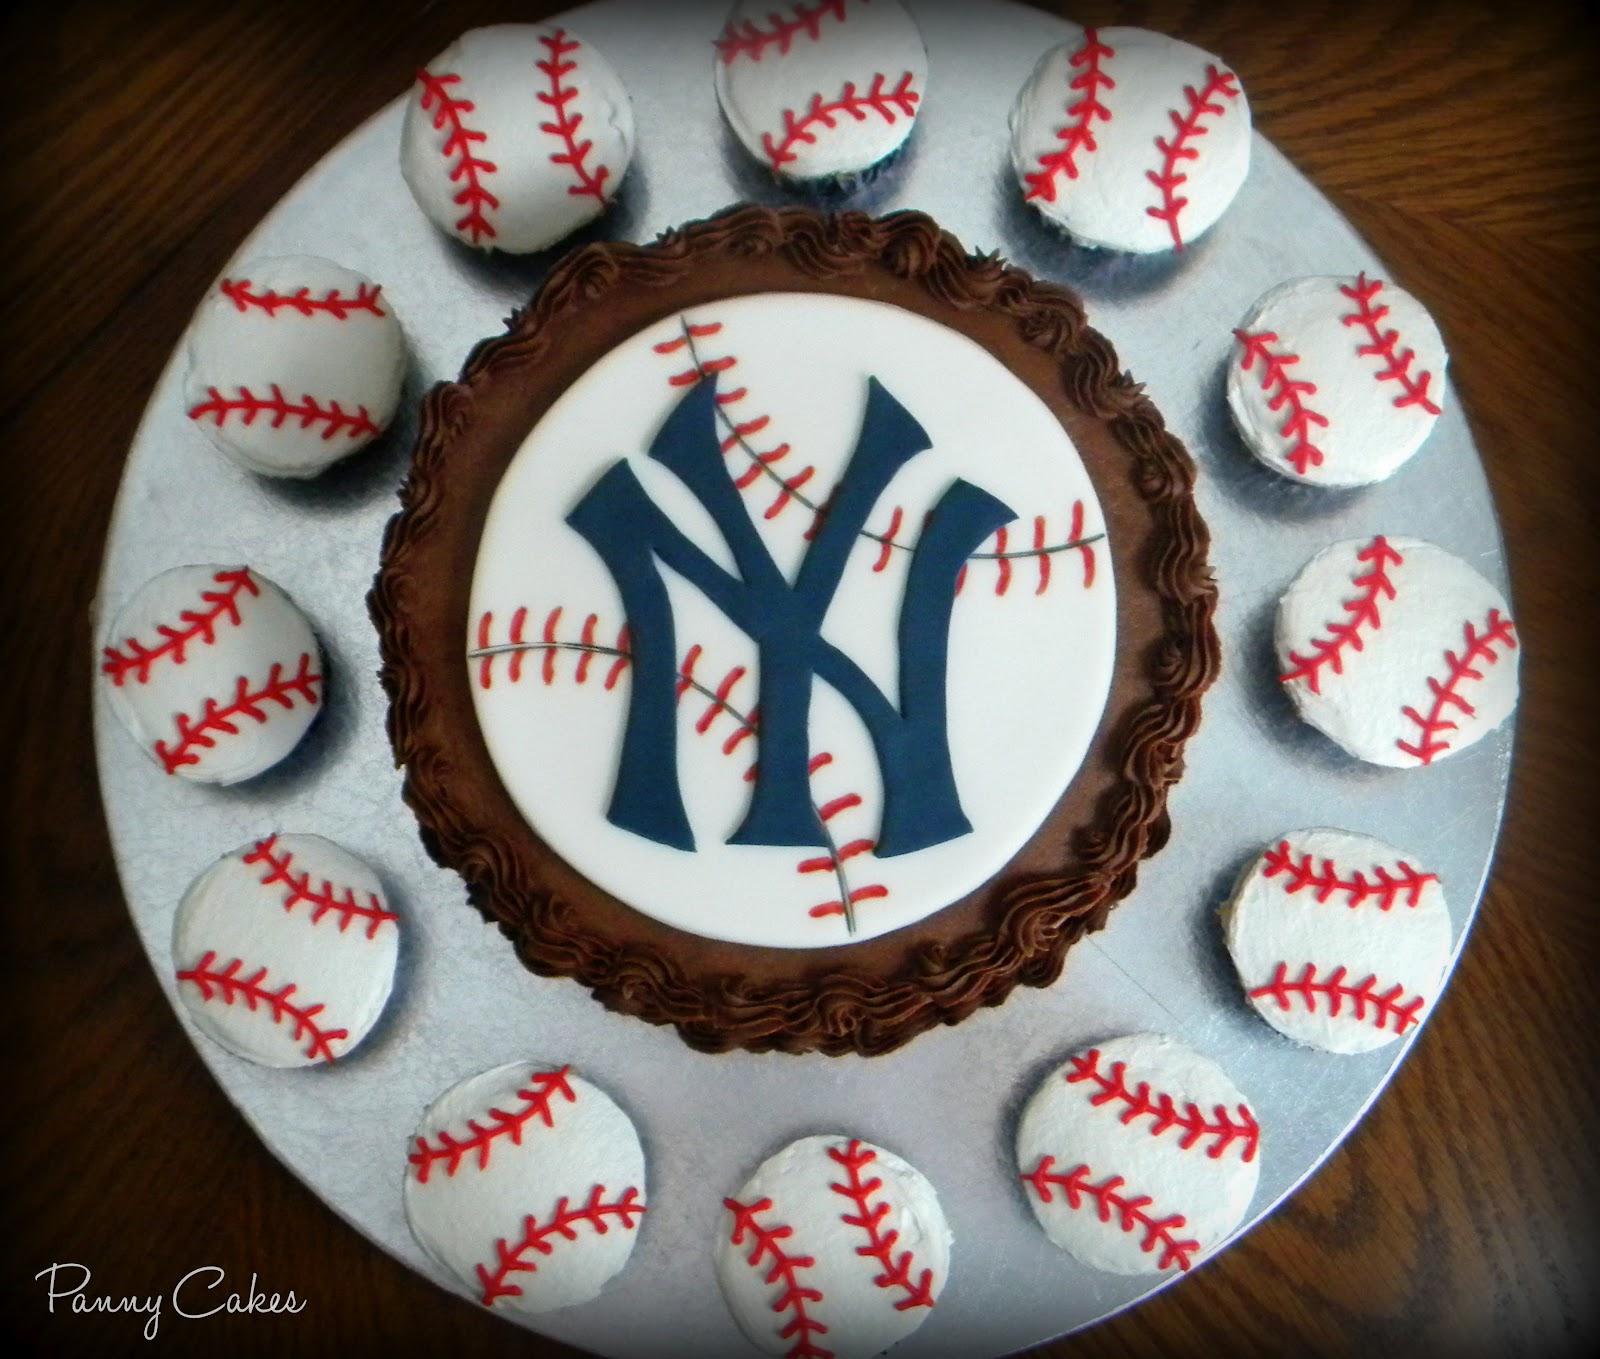 Tremendous 10 Ny Yankees Cupcakes And Cakes Photo New York Yankees Birthday Funny Birthday Cards Online Benoljebrpdamsfinfo